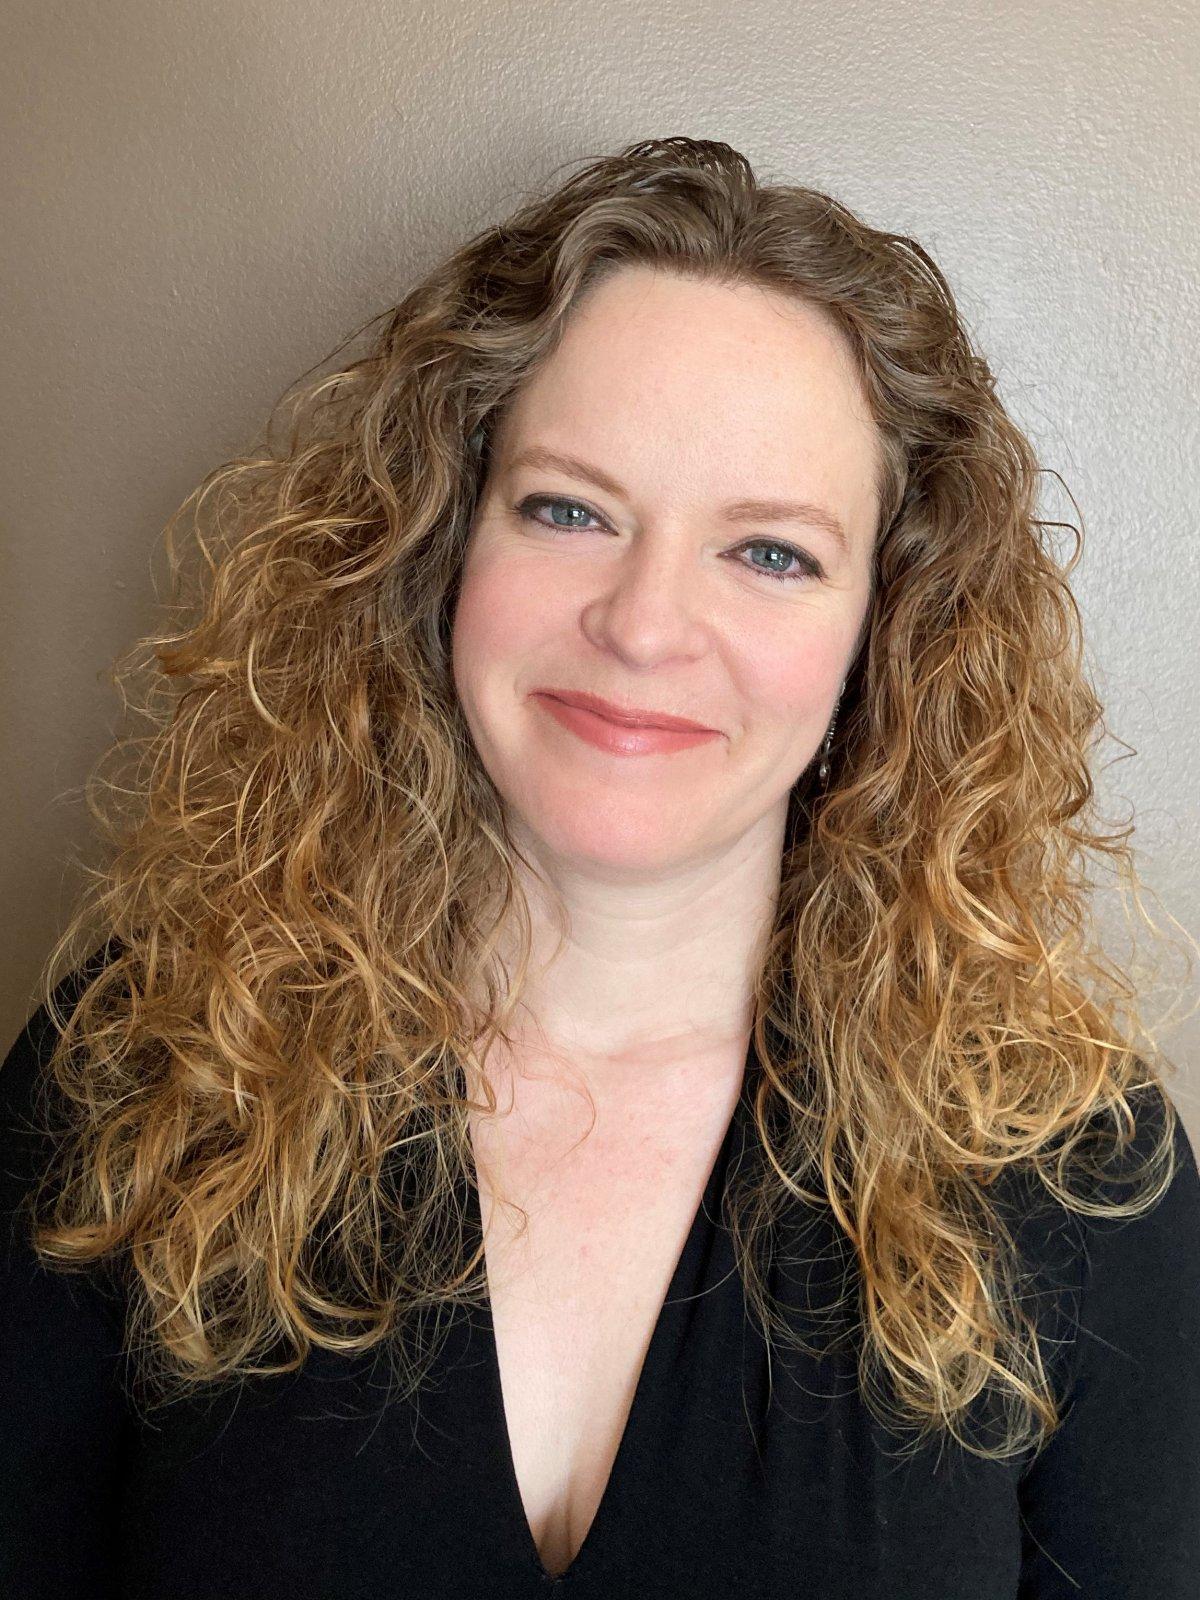 Erin E. MacDonald, author of 'Ian Rankin: A Companion to the Mystery Fiction.'.